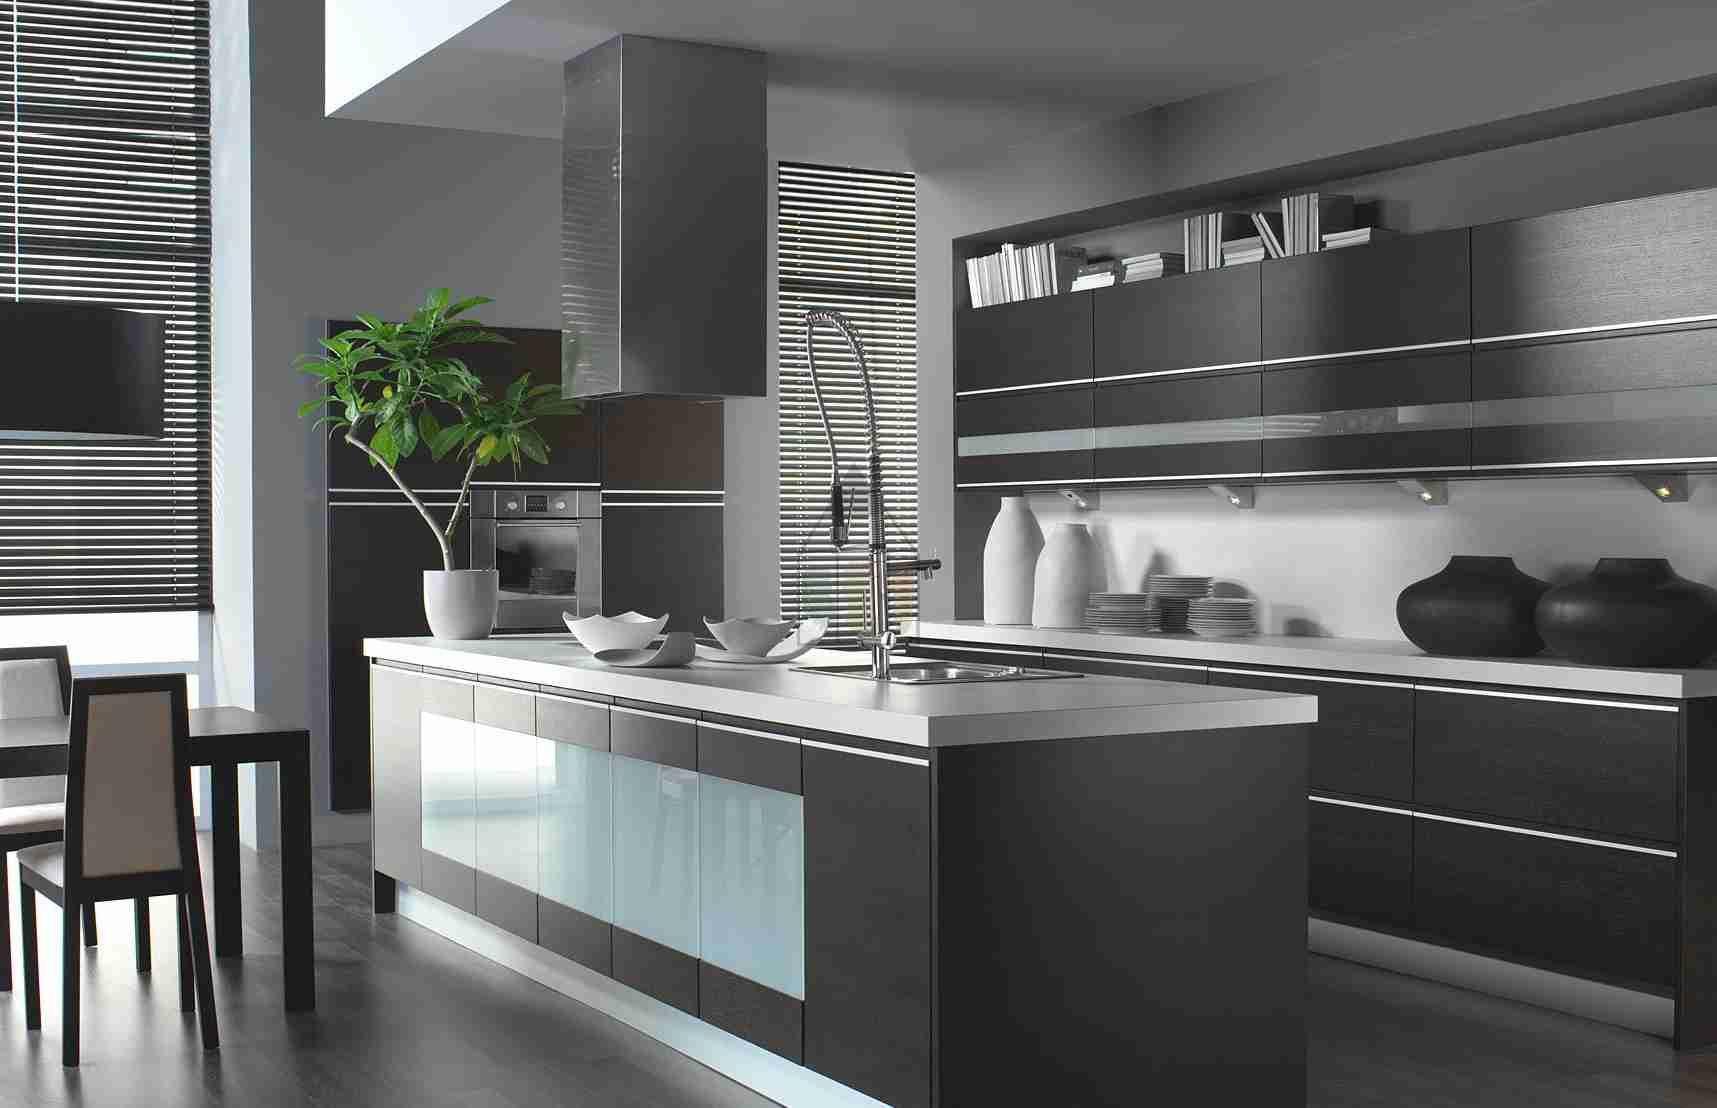 pakistani kitchen design 2017 European kitchen design